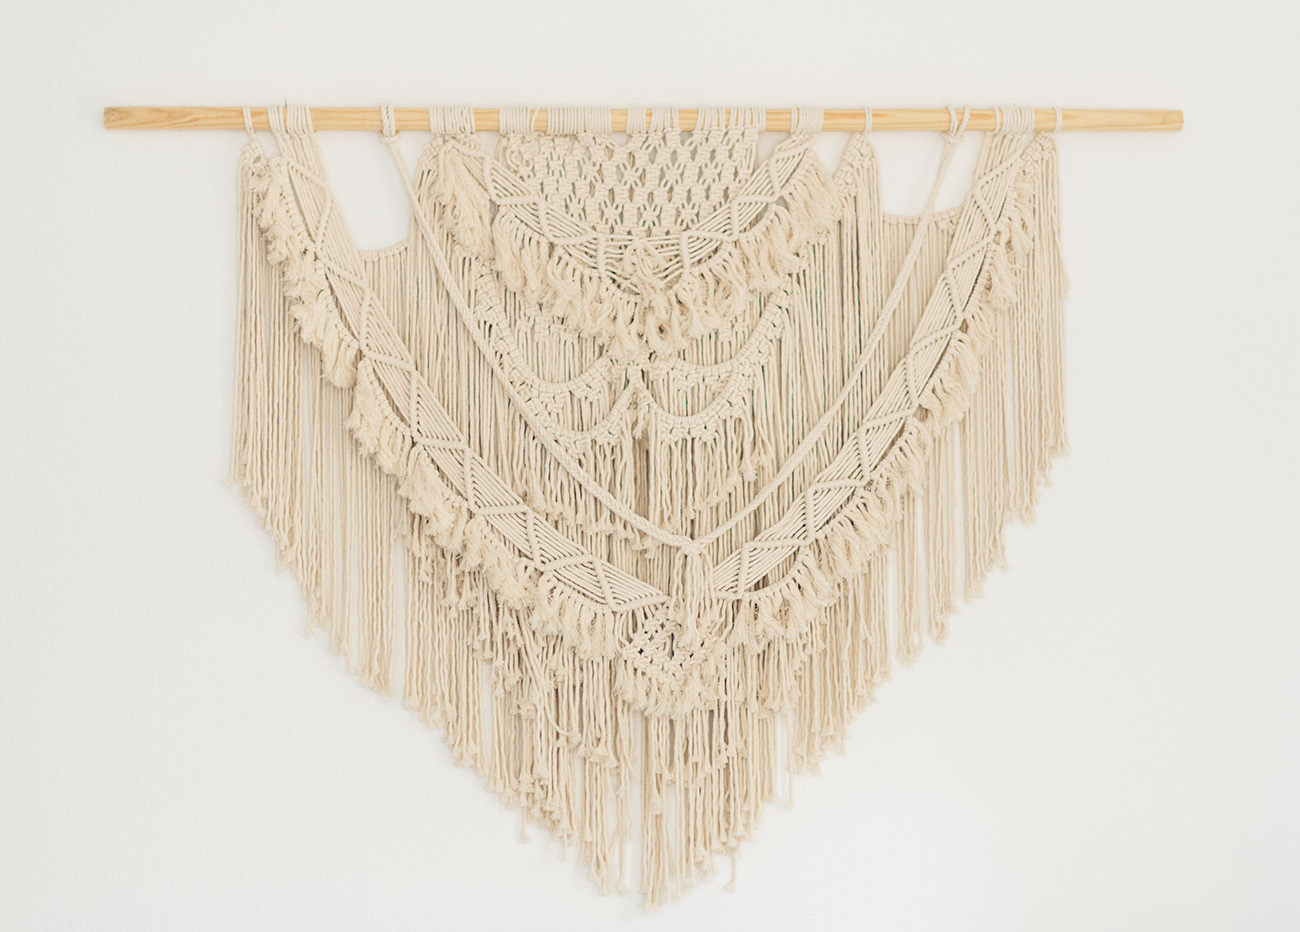 Handmade Weaving